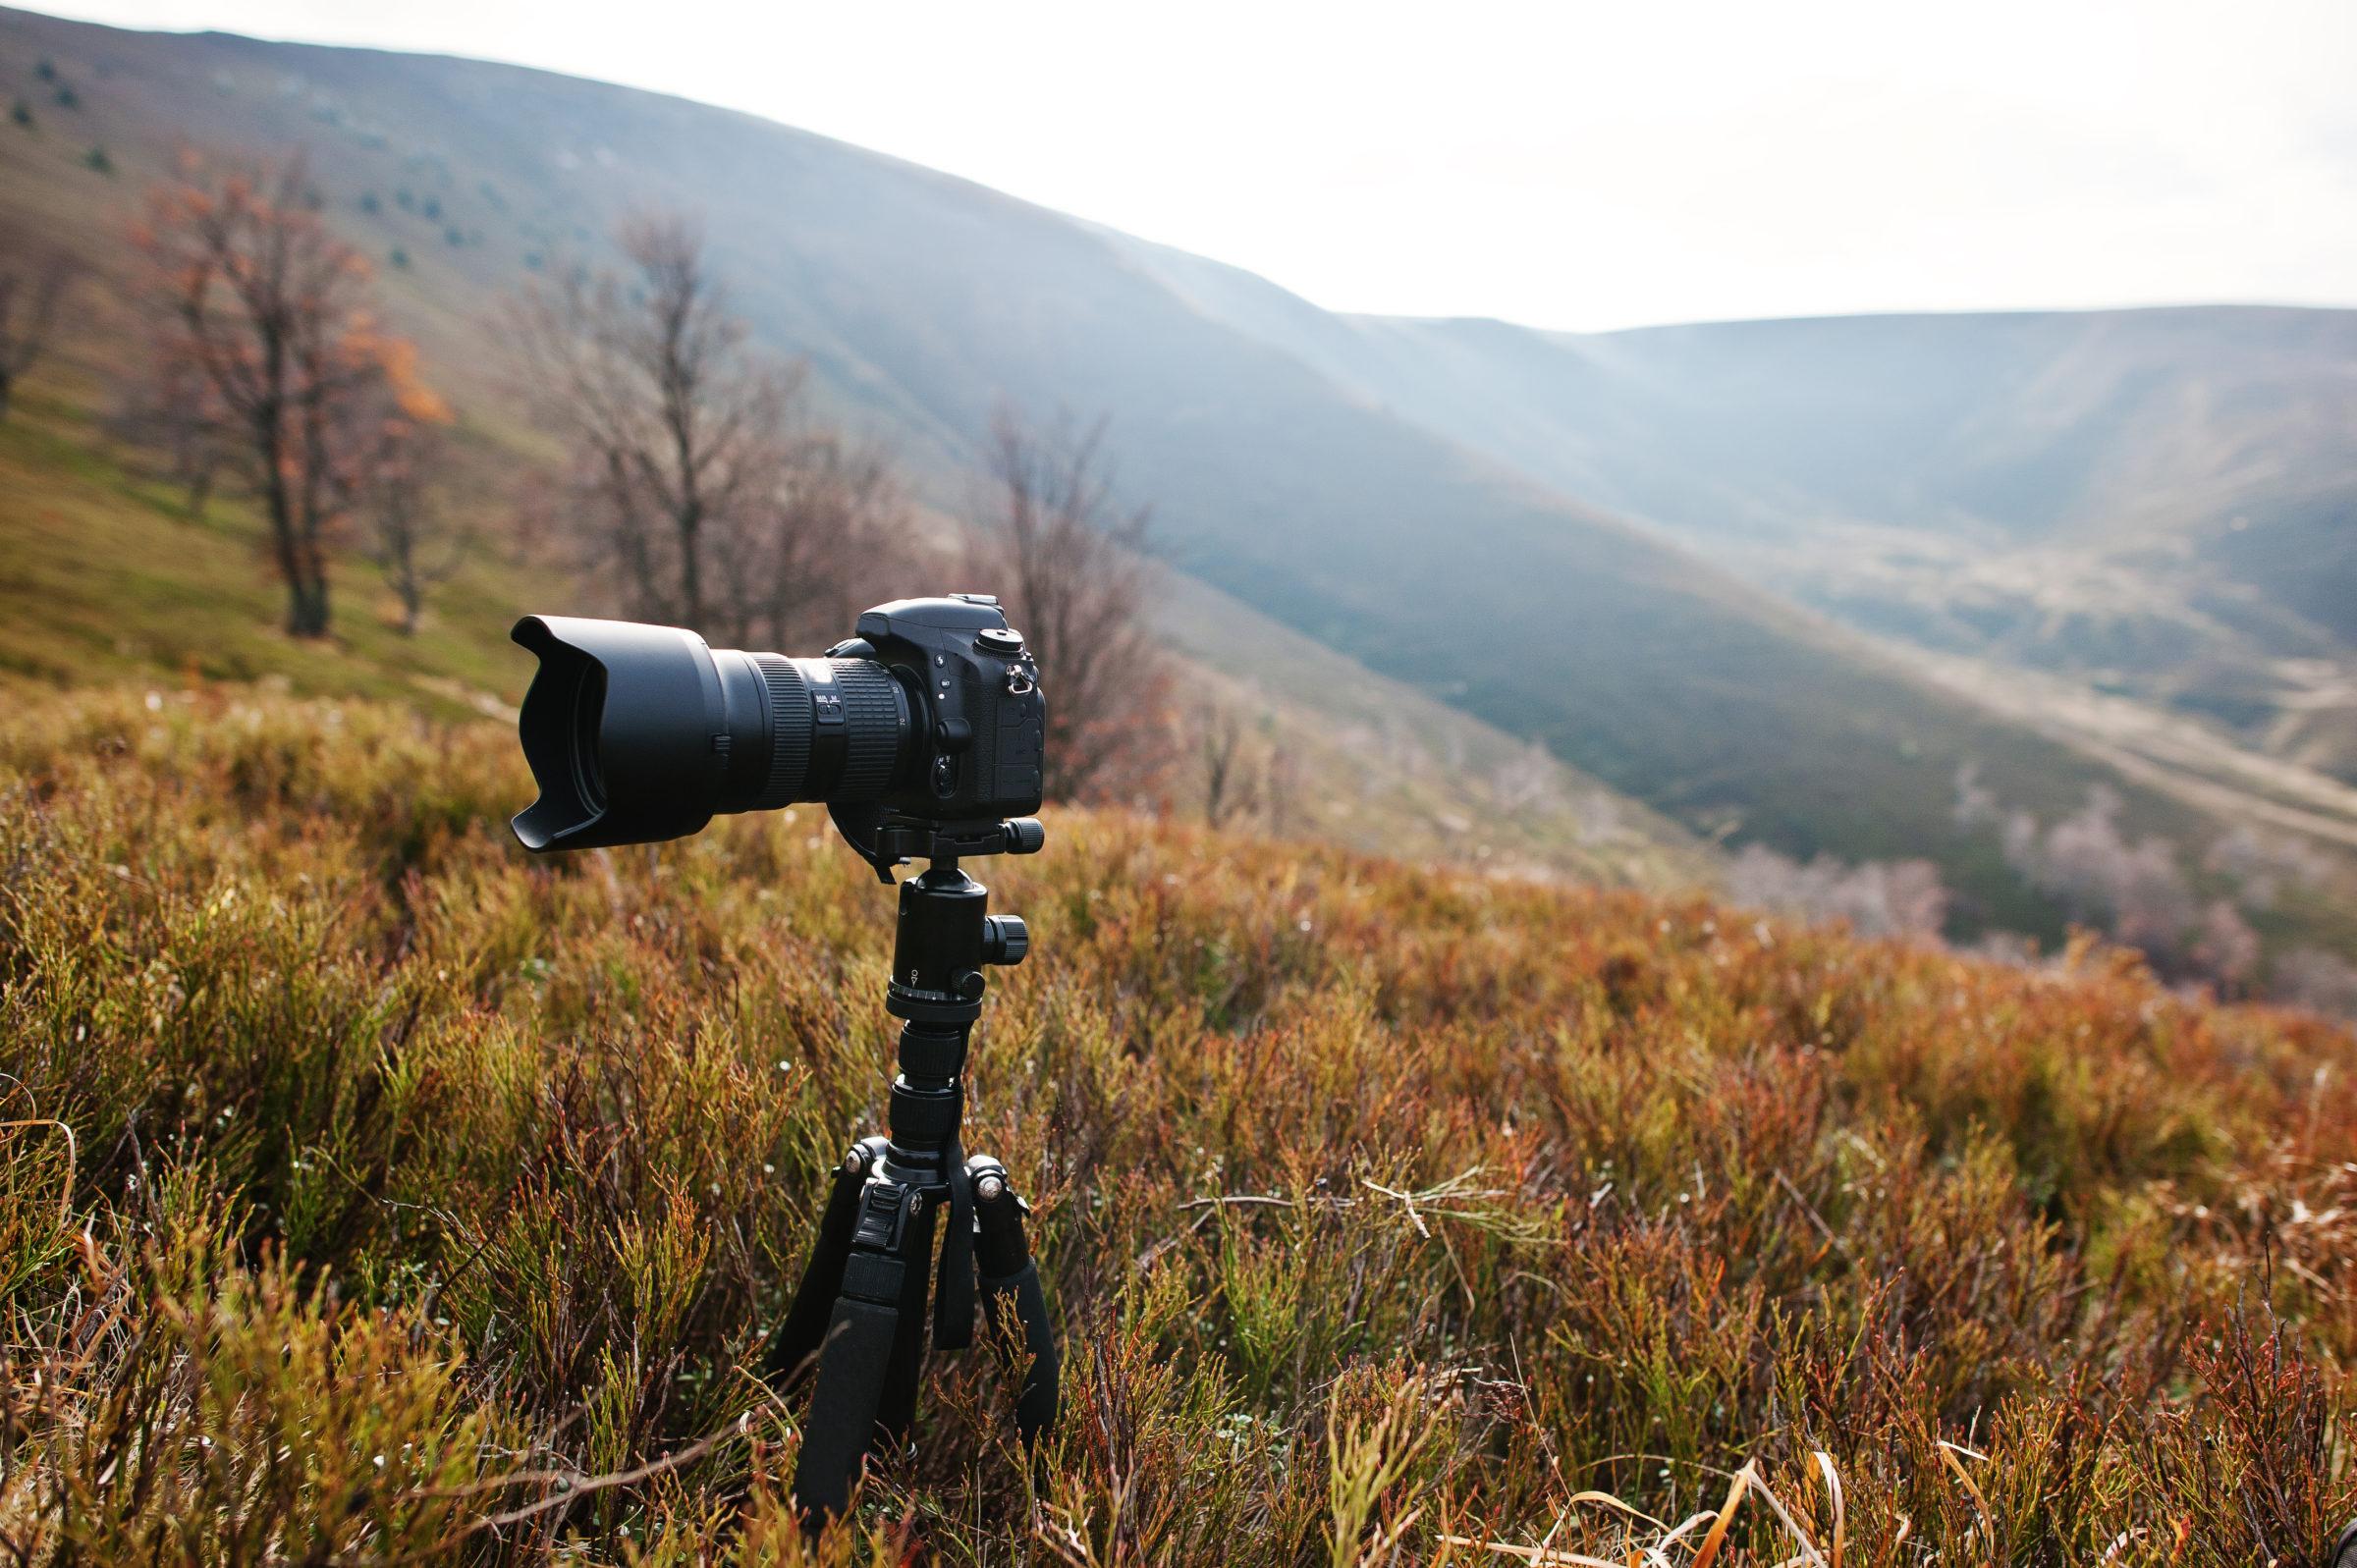 modern professional dslr camera on a tripod outdo 2021 04 25 23 43 33 utc